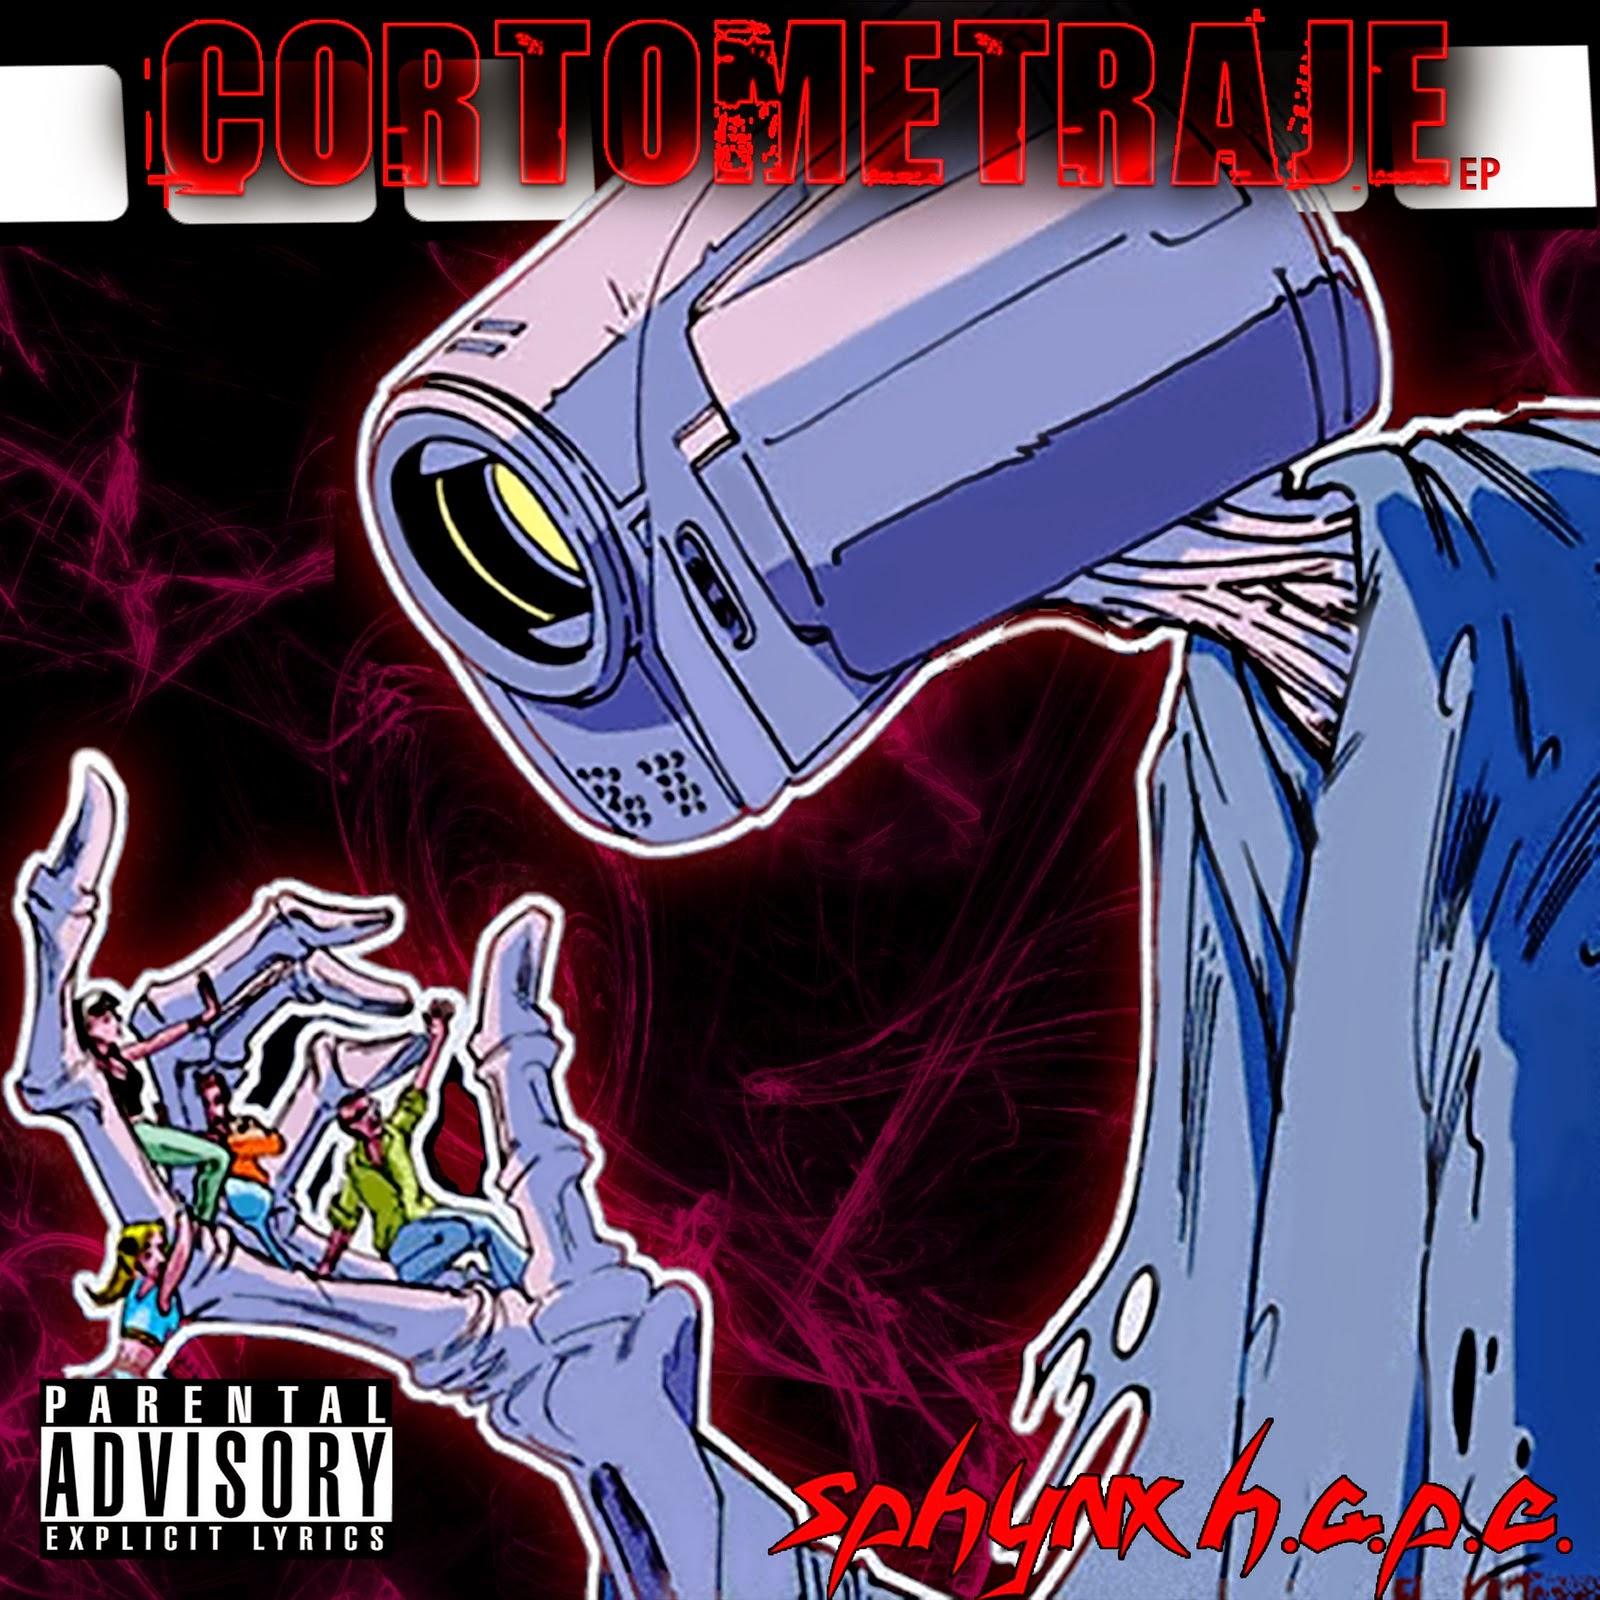 Sphynx Hape - Cortometraje EP [2011]